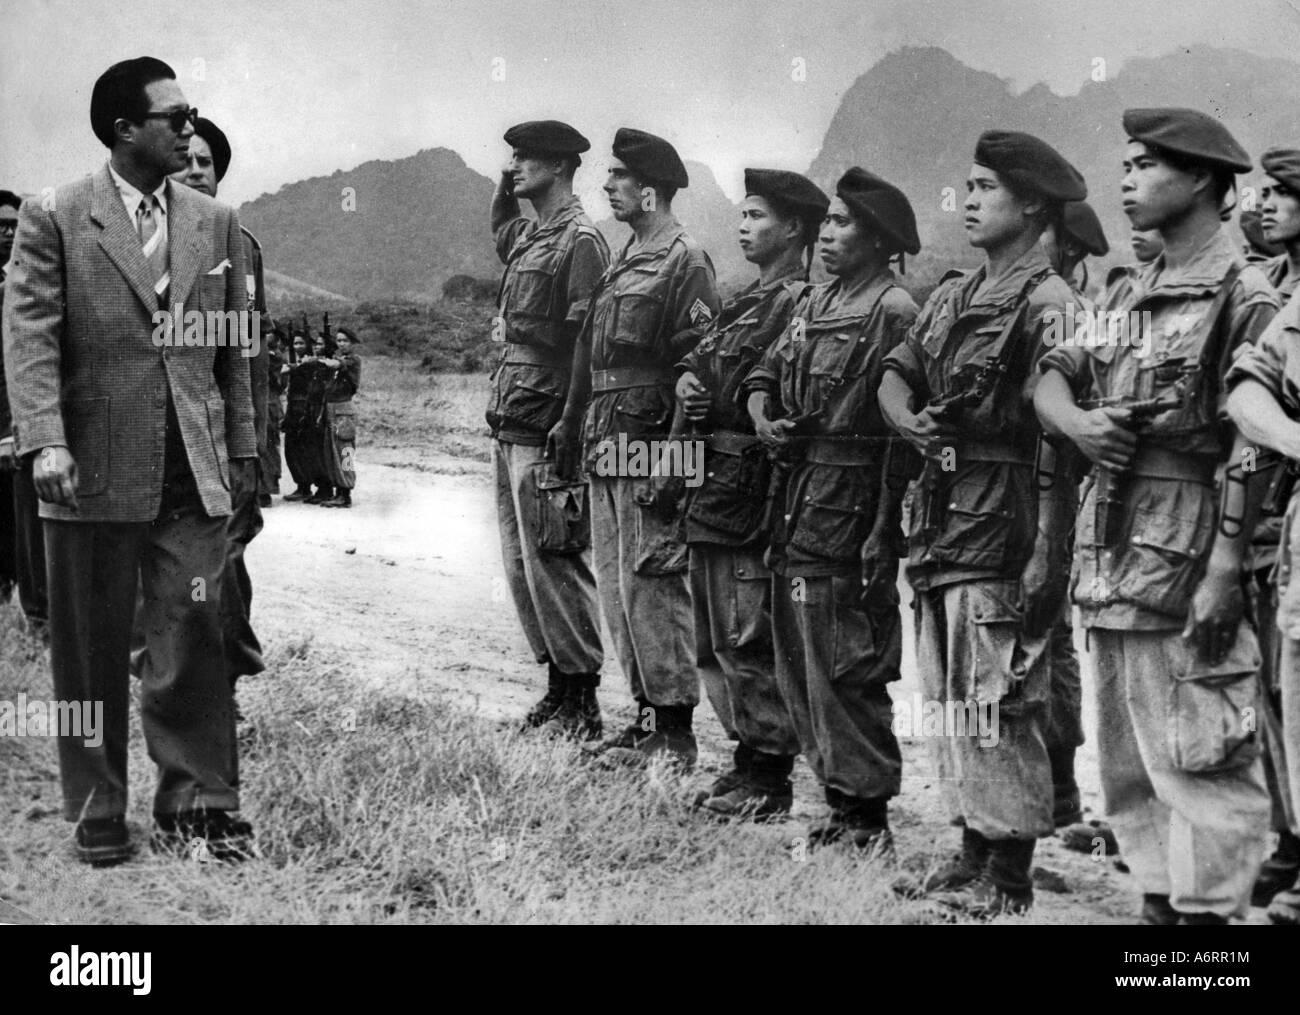 https://i1.wp.com/c8.alamy.com/comp/A6RR1M/bao-dai-22101913-3171997-emperor-of-vietnam-1926-1945-head-of-state-A6RR1M.jpg